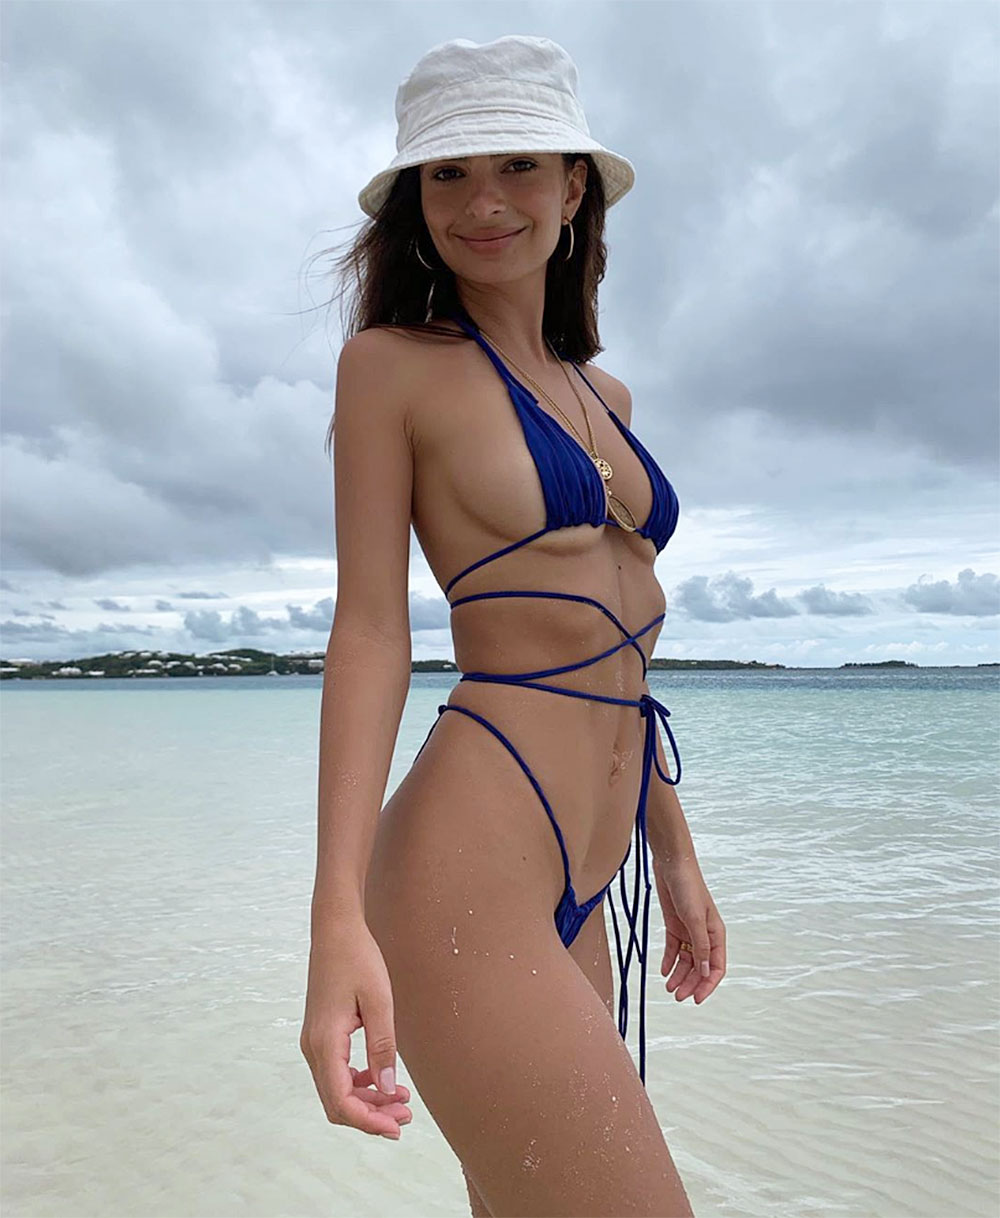 Best 2019Pics Of Bodies Celebrity BeachBikiniSwimsuit 4AL35cjRqS